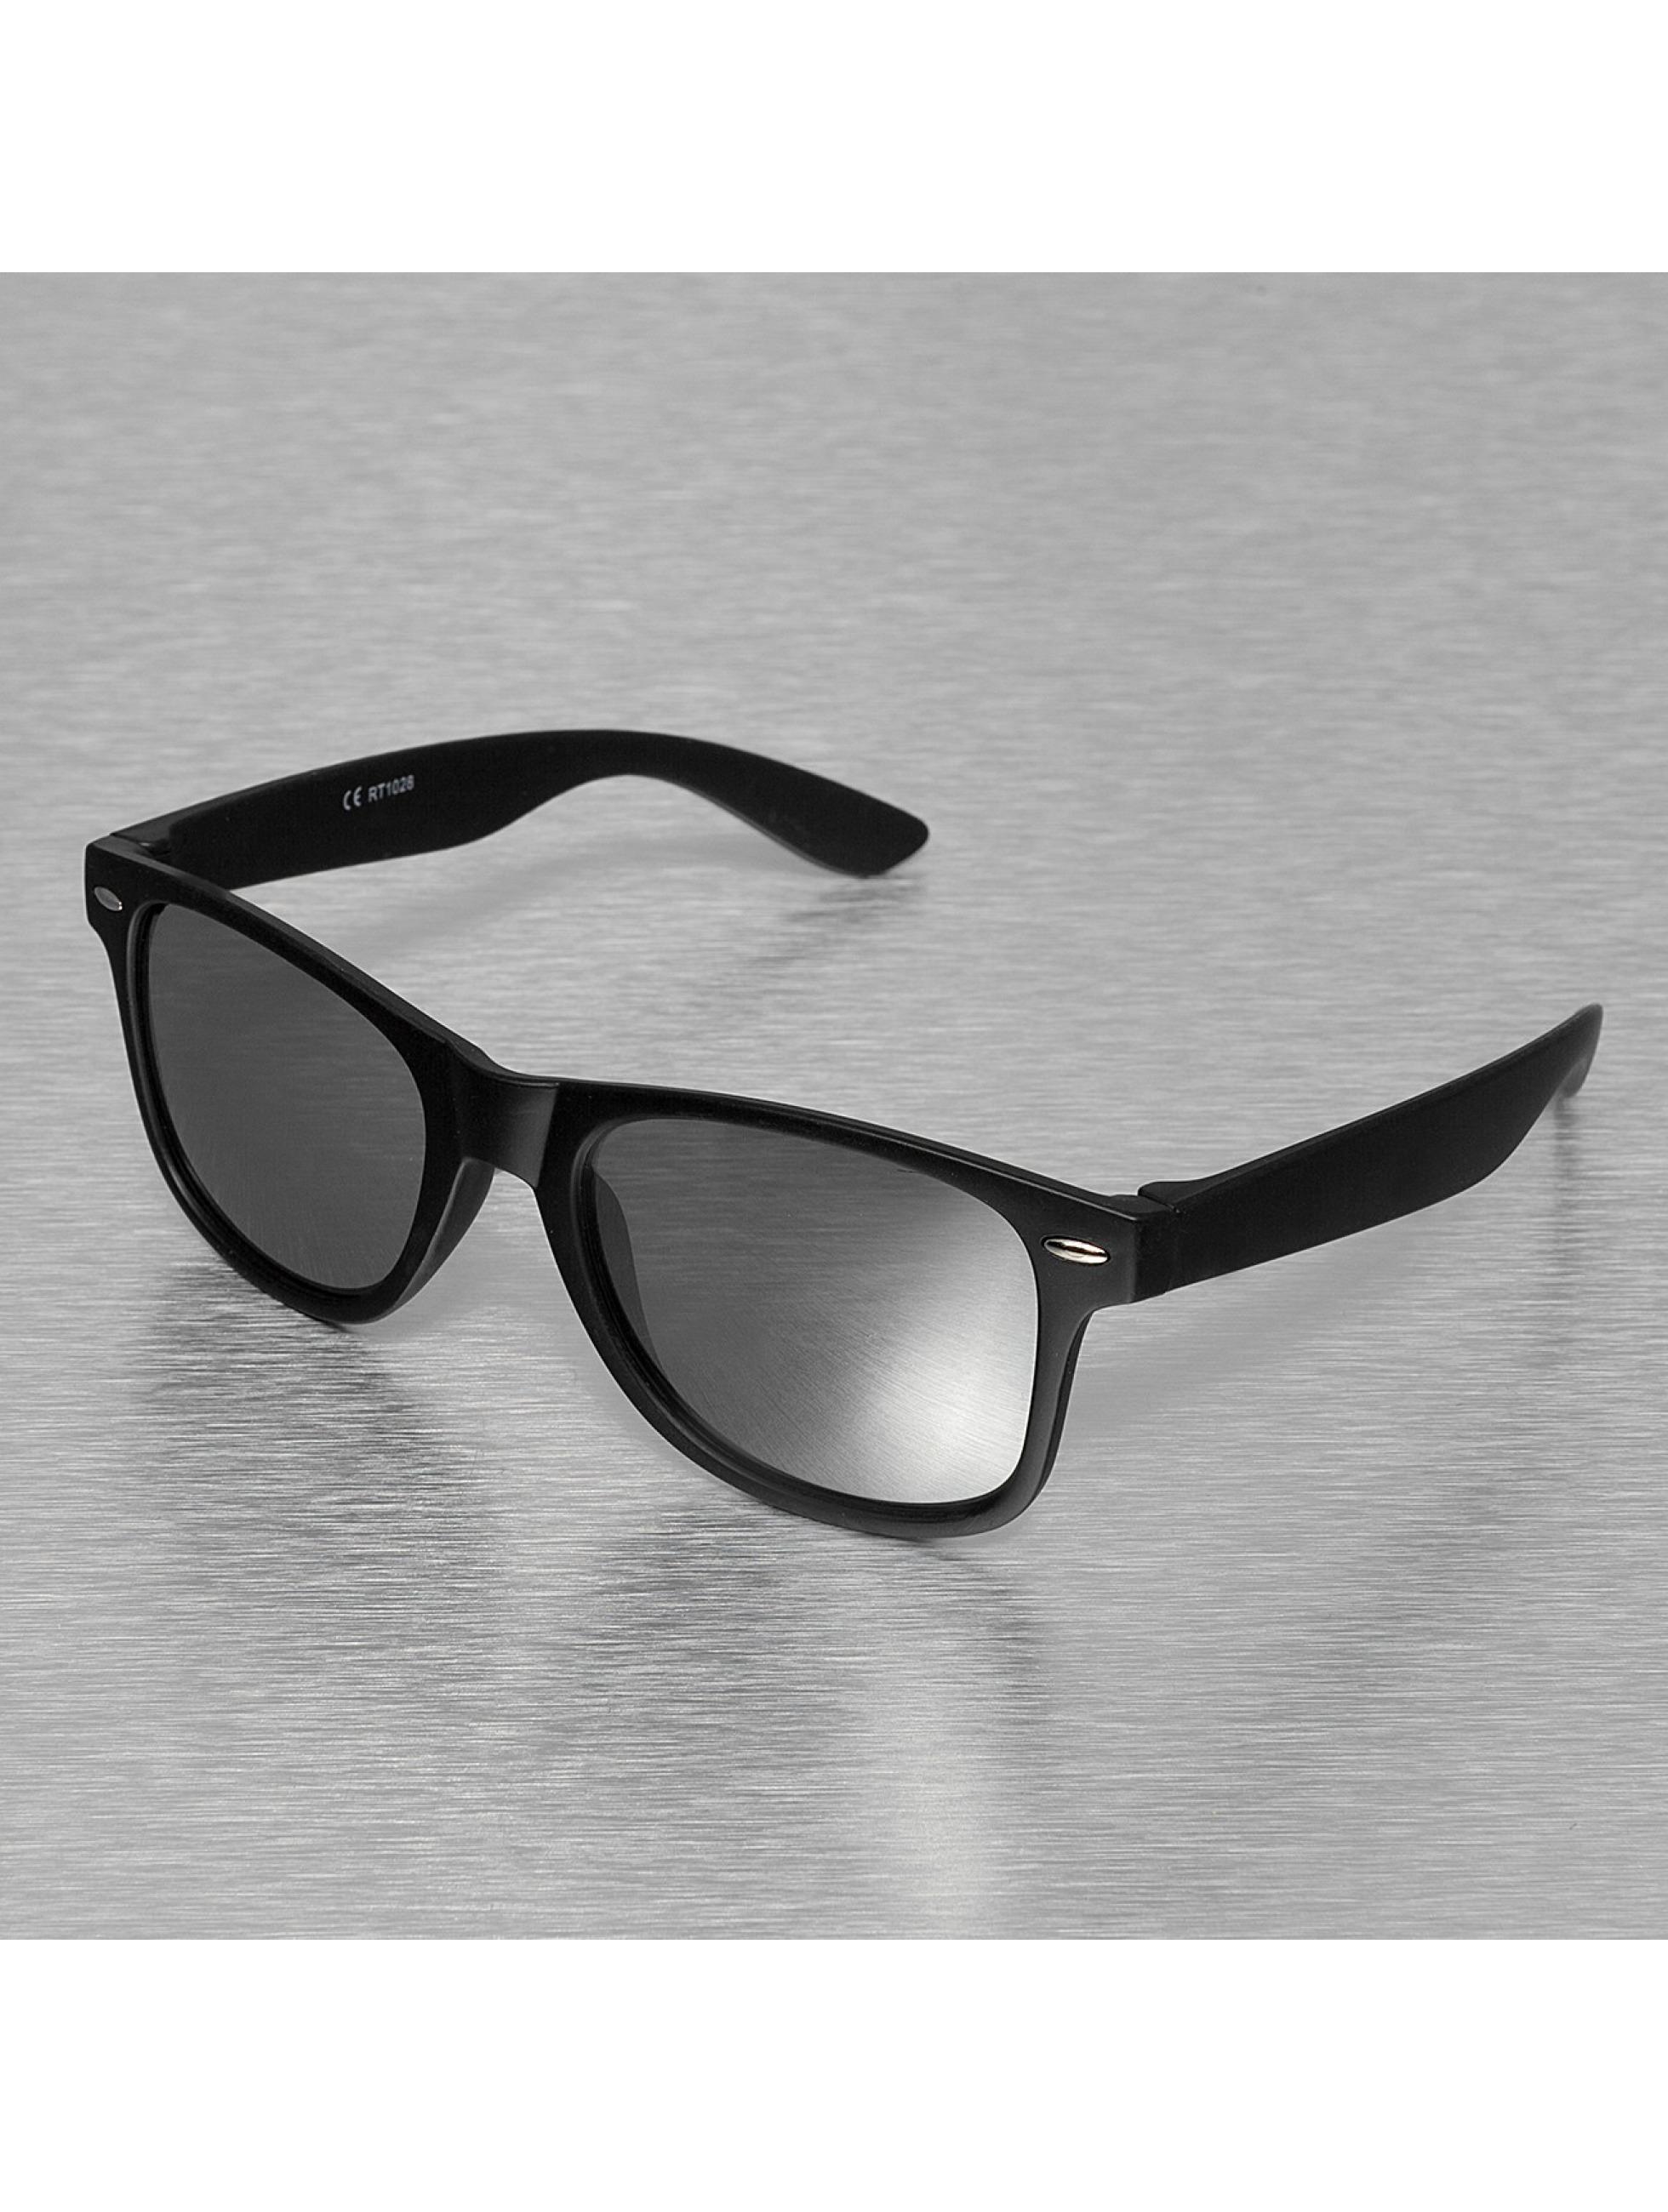 Miami Vision Aurinkolasit Vision musta